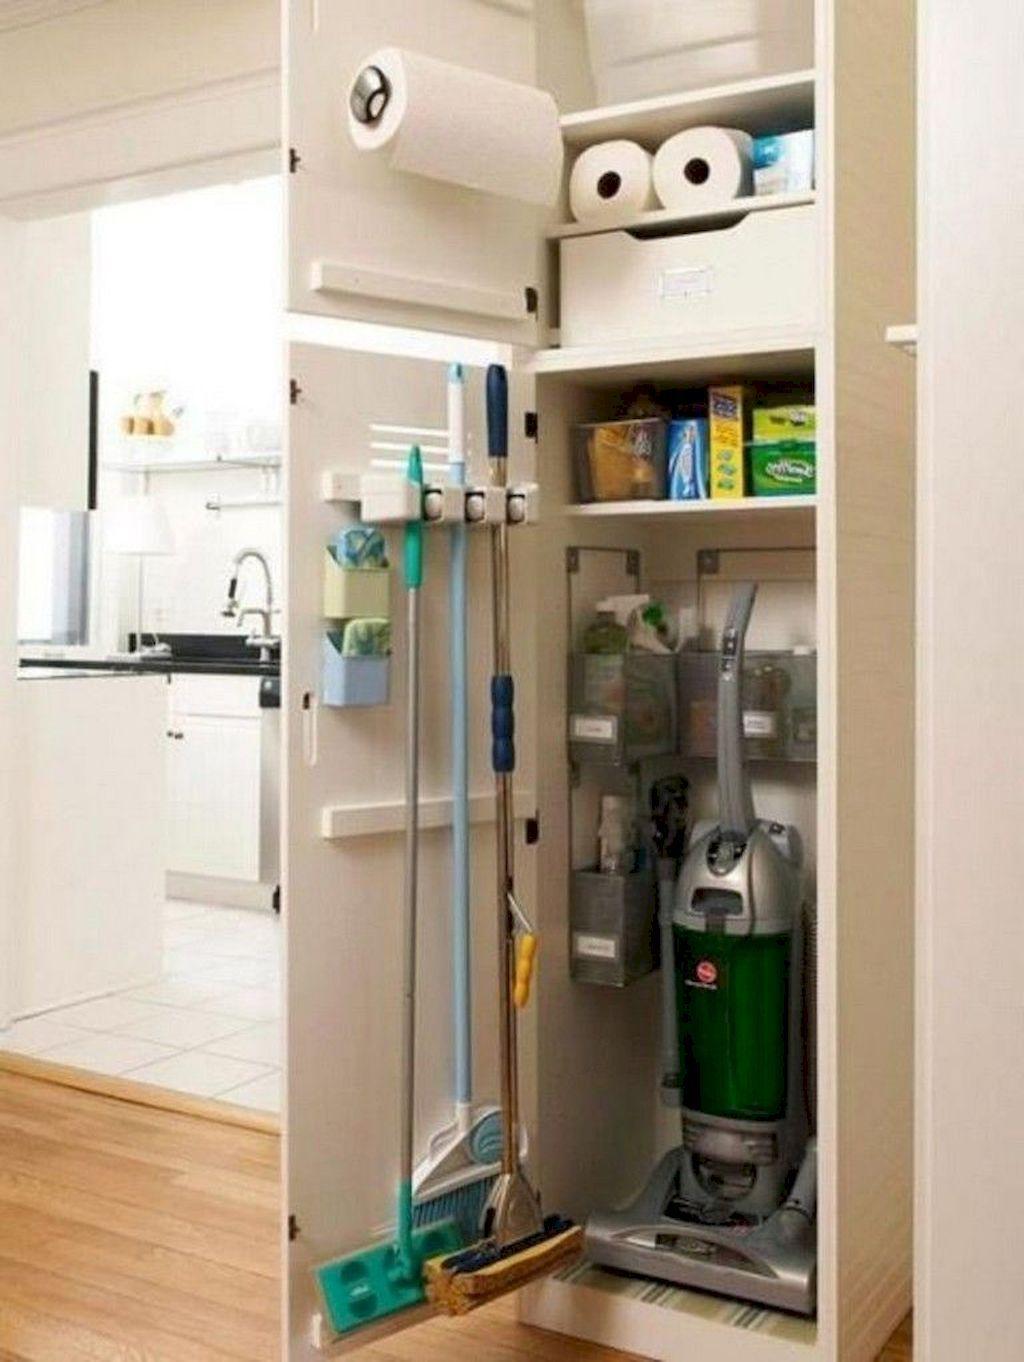 65 Space Saving Tiny House Storage Organization and Tips Ideas – homixover.com